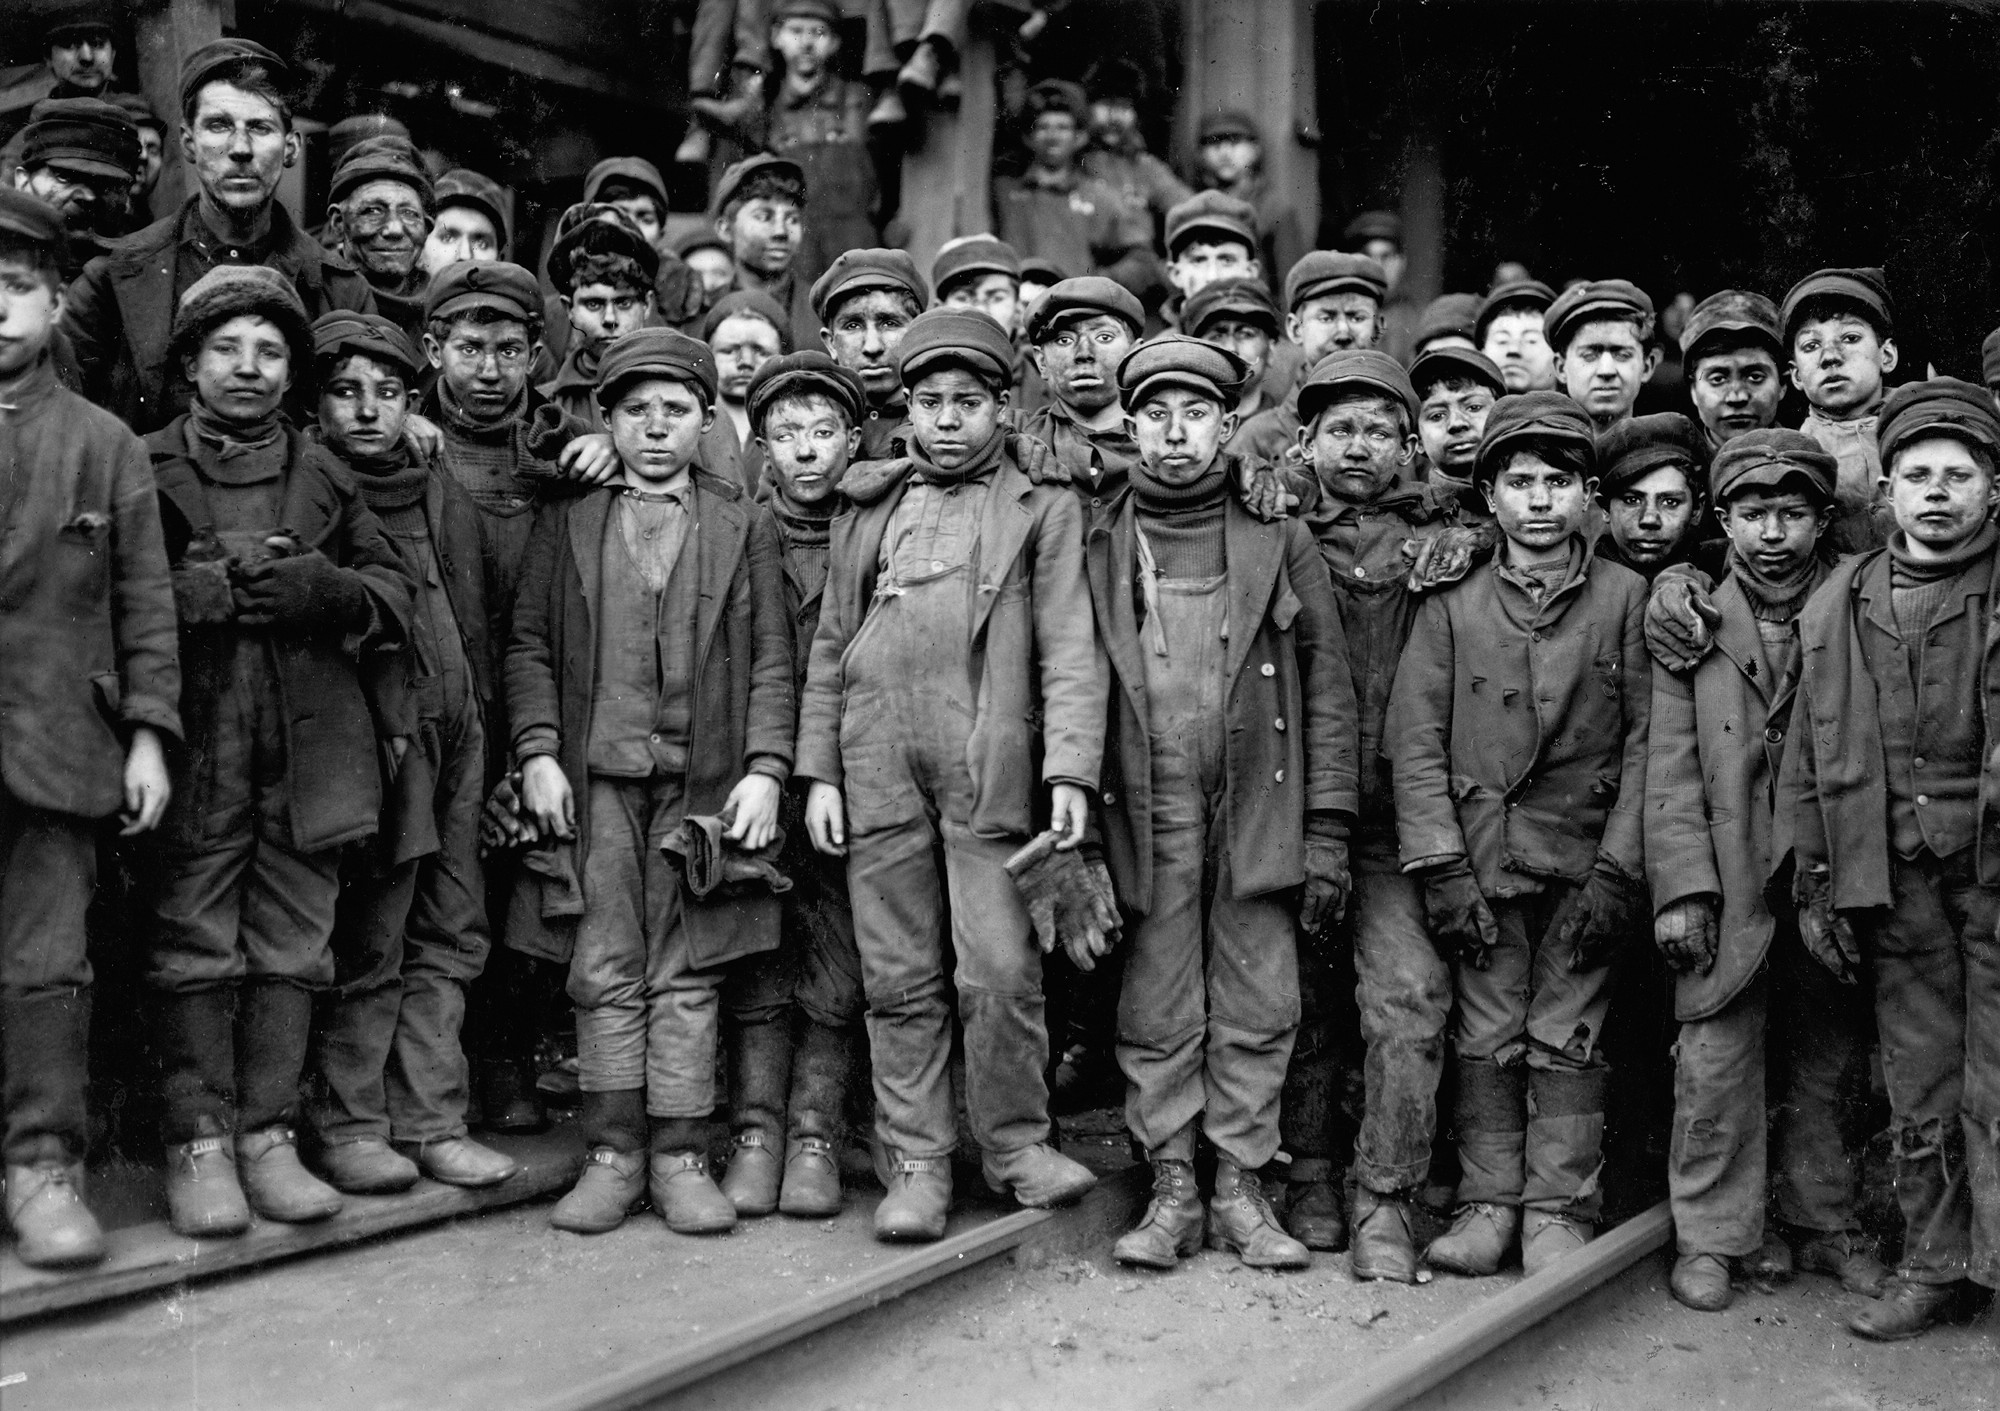 Breaker boys working in Ewen Breaker of Pennsylvania Coal Co. South Pittston, Pennsylvania